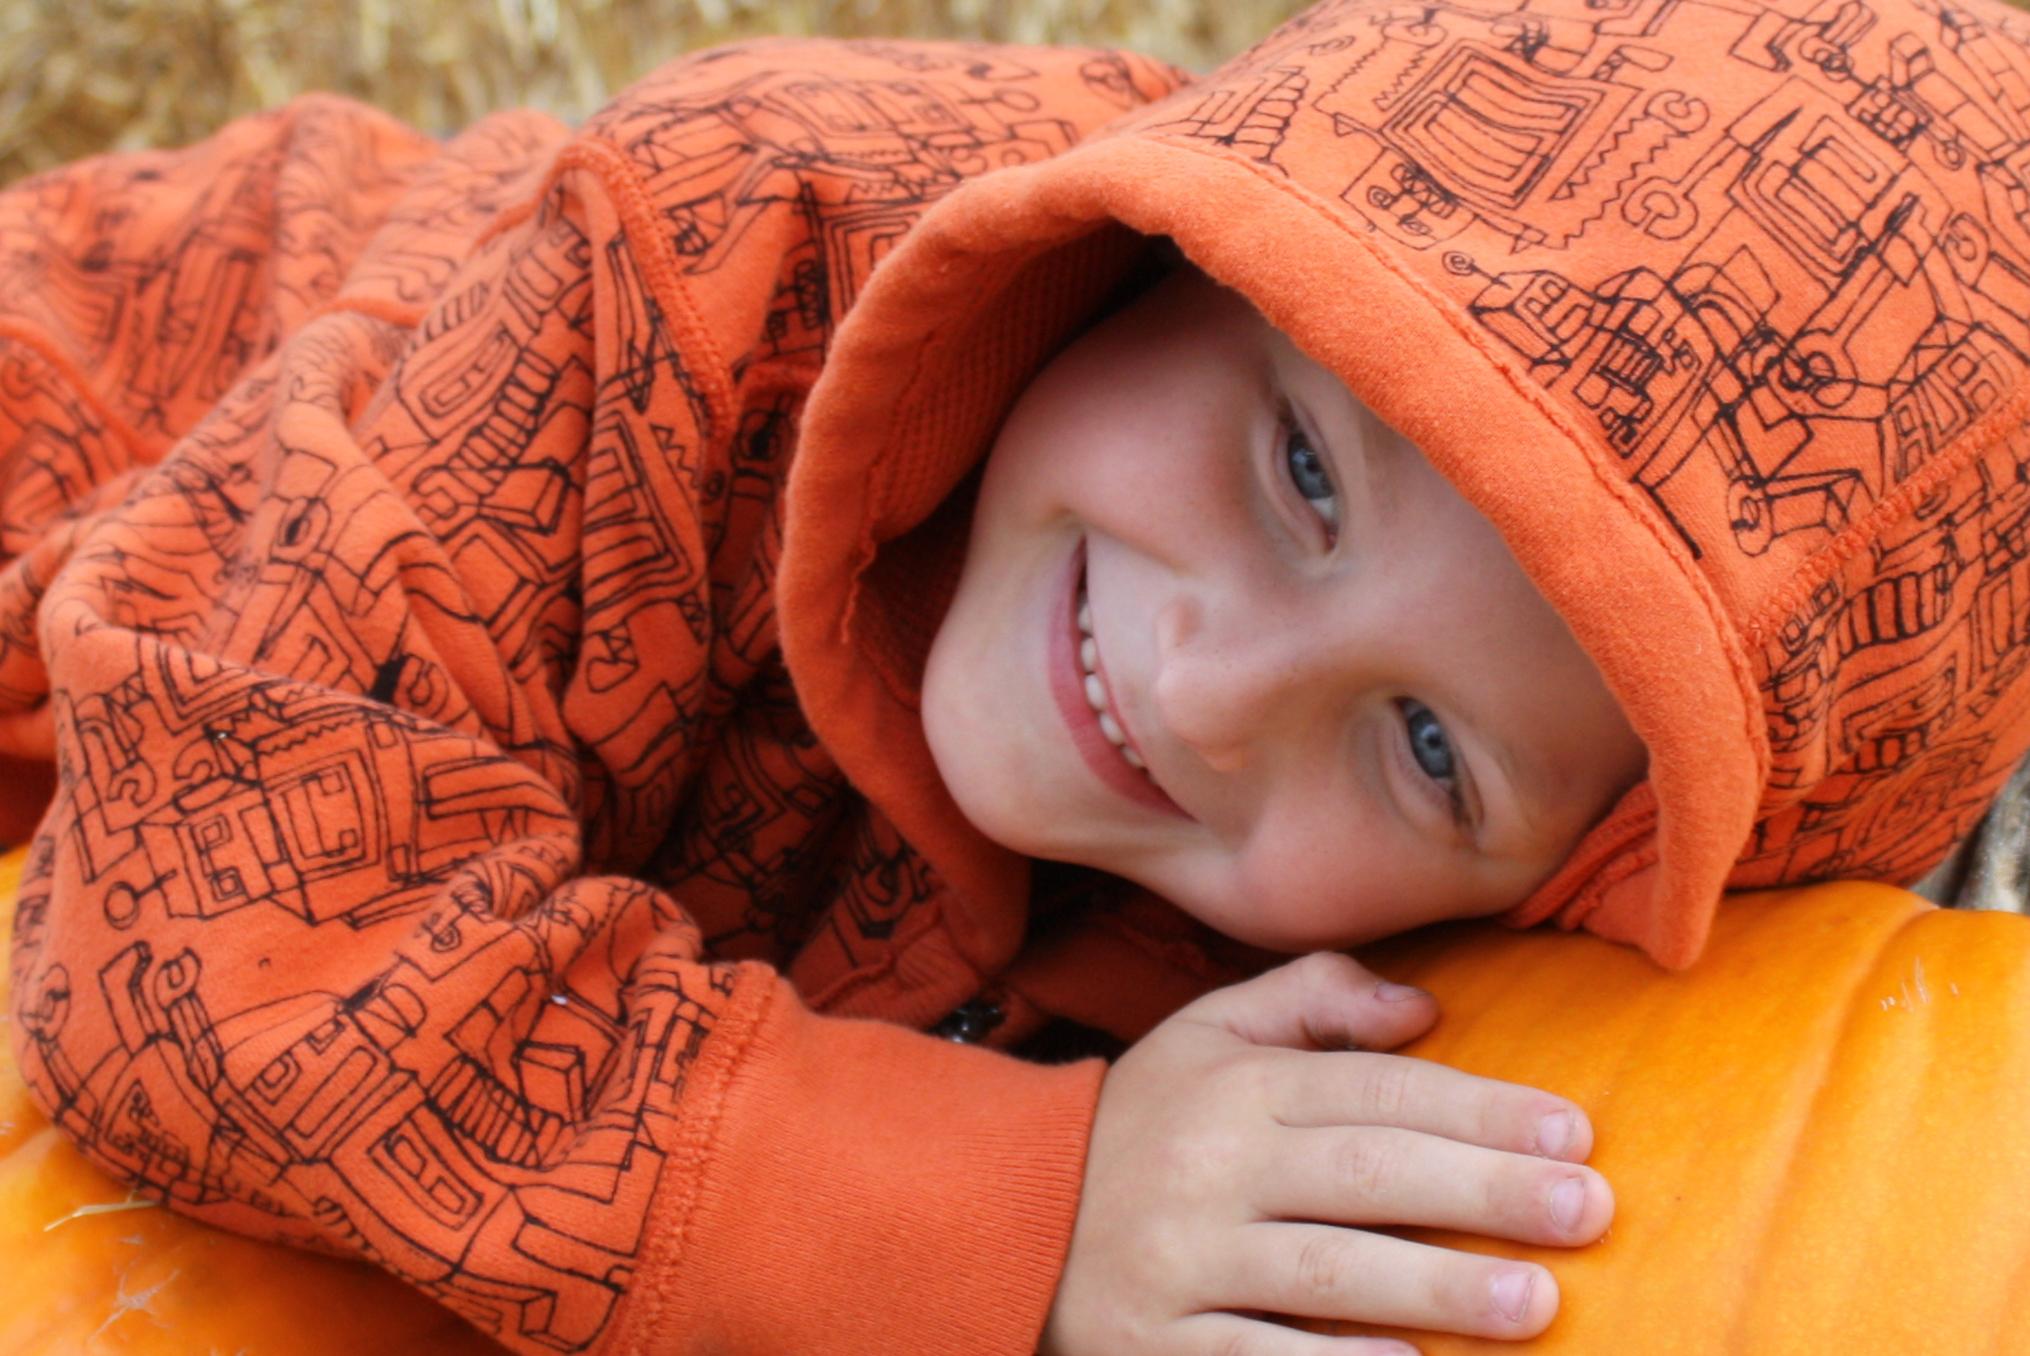 Boy in orange sweatshirt